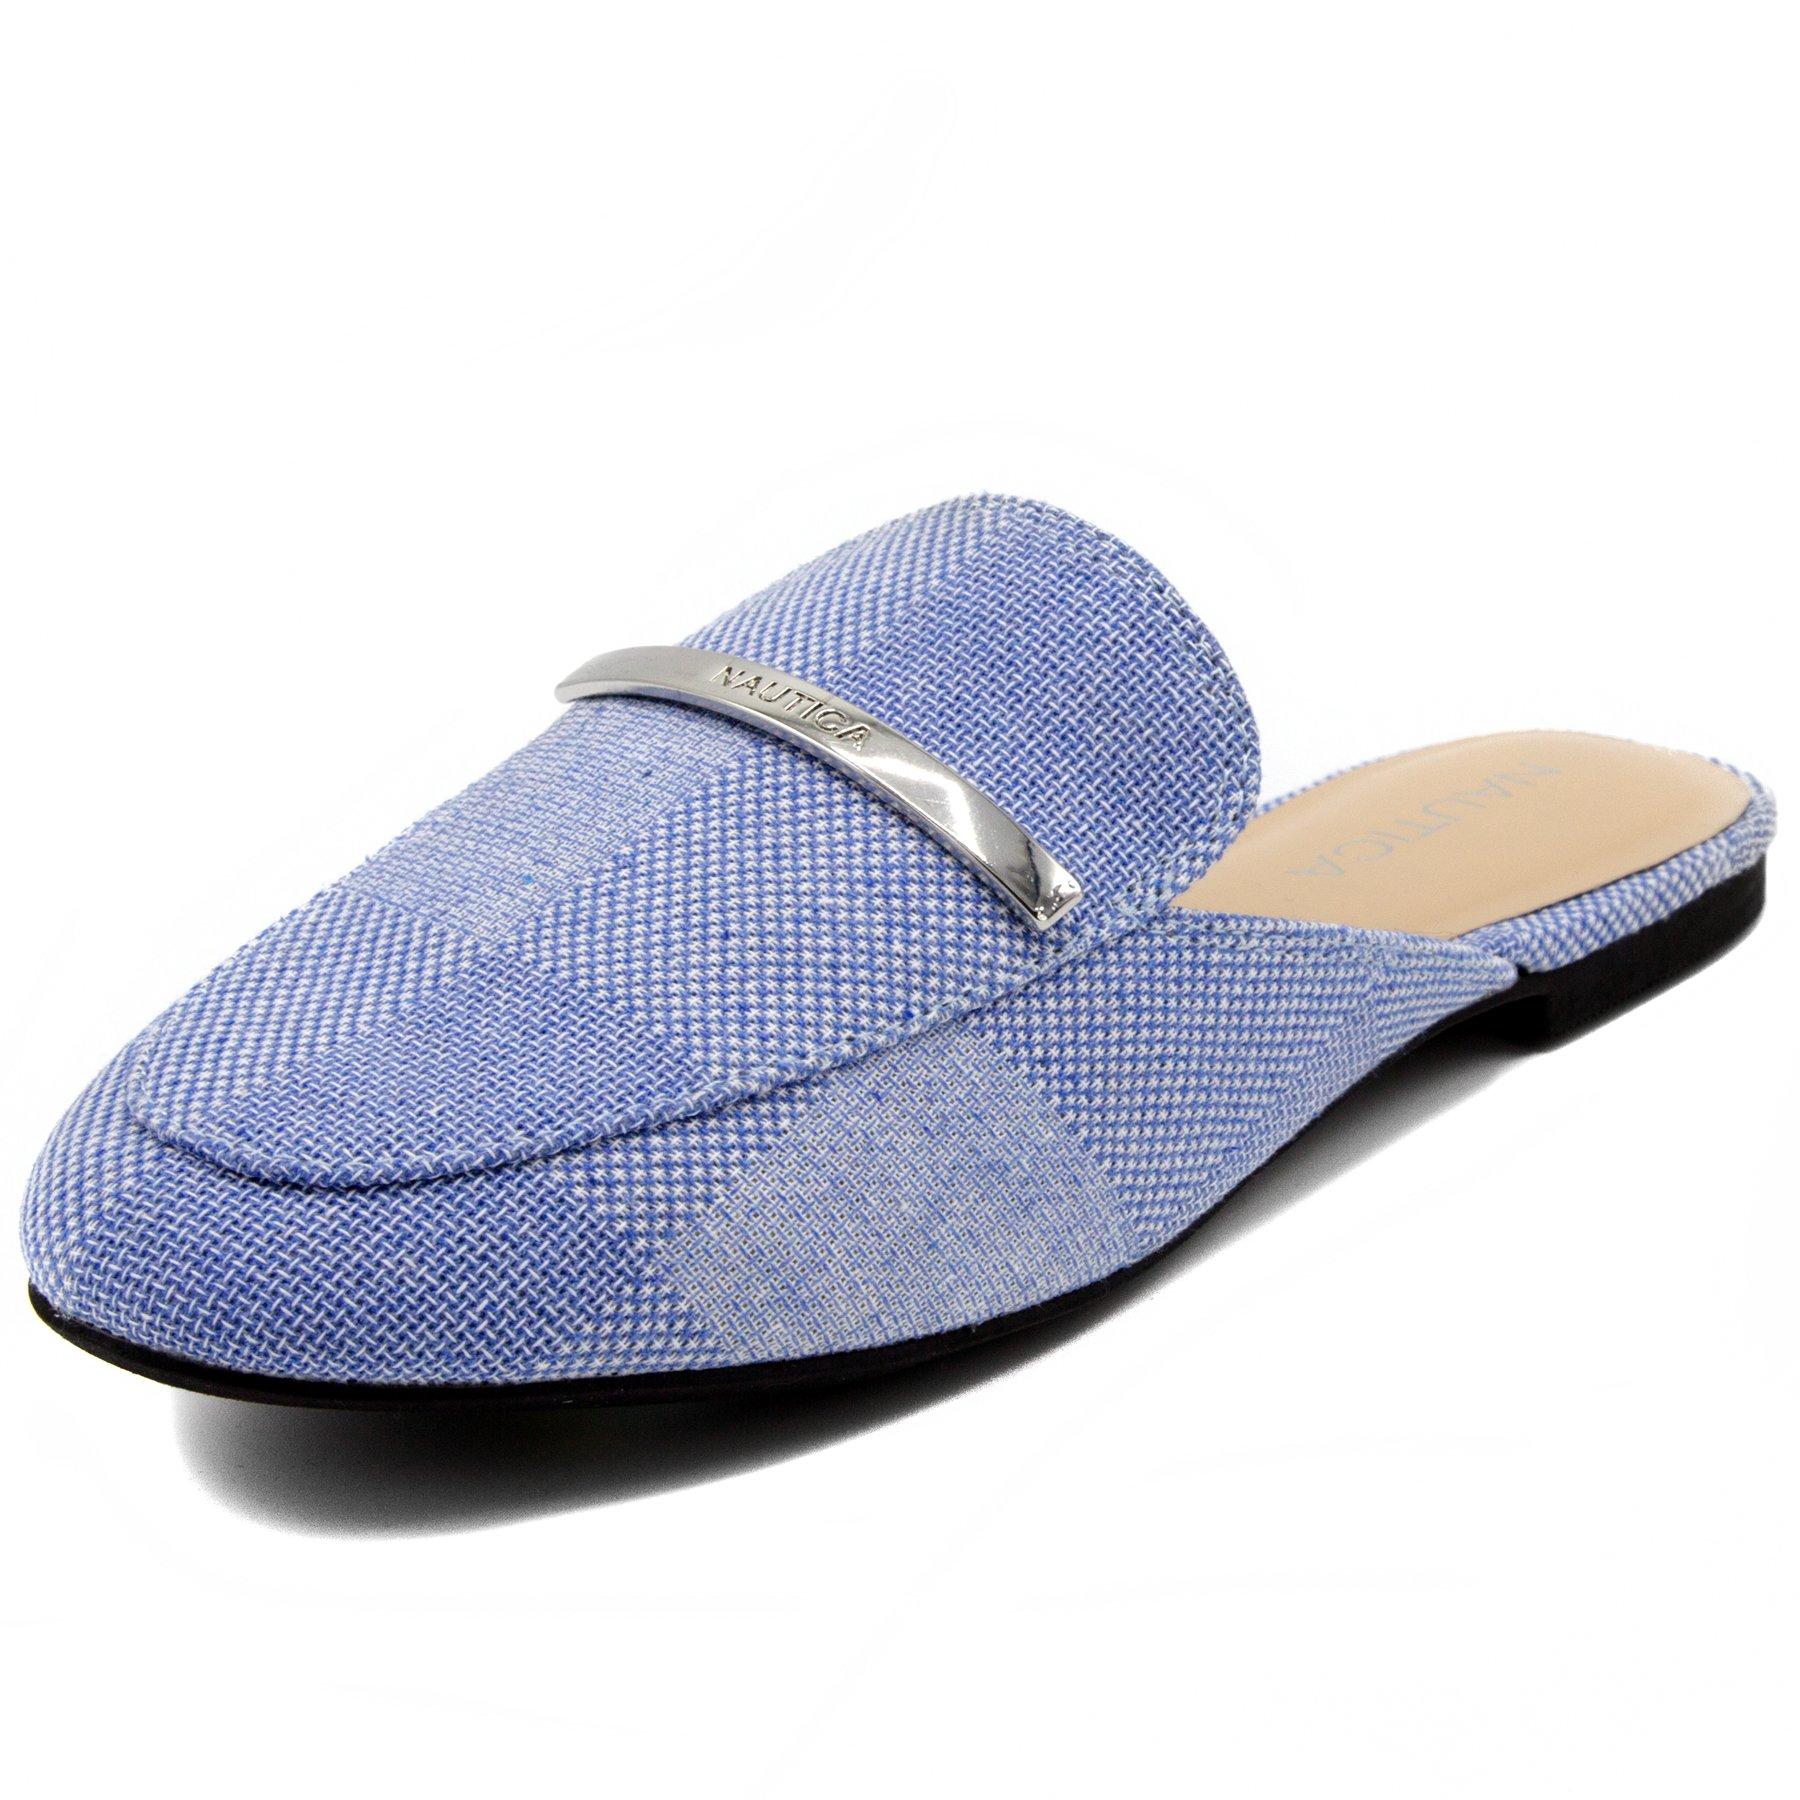 Nautica Women's Labella Mule Slide Backless Slip On Loafers-Blue -6